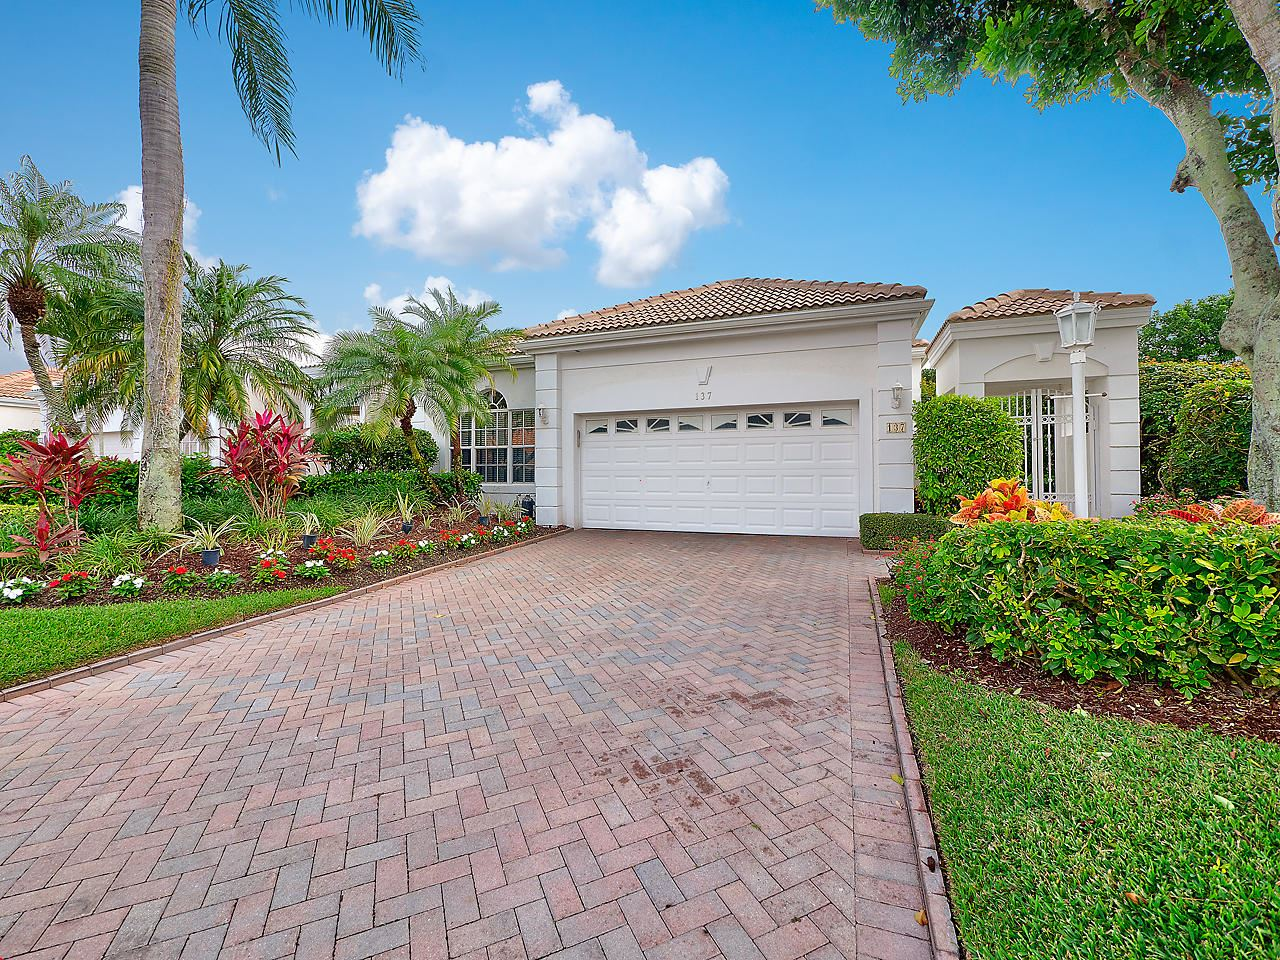 Photo of 137 Coral Cay Drive, Palm Beach Gardens, FL 33418 (MLS # RX-10678684)